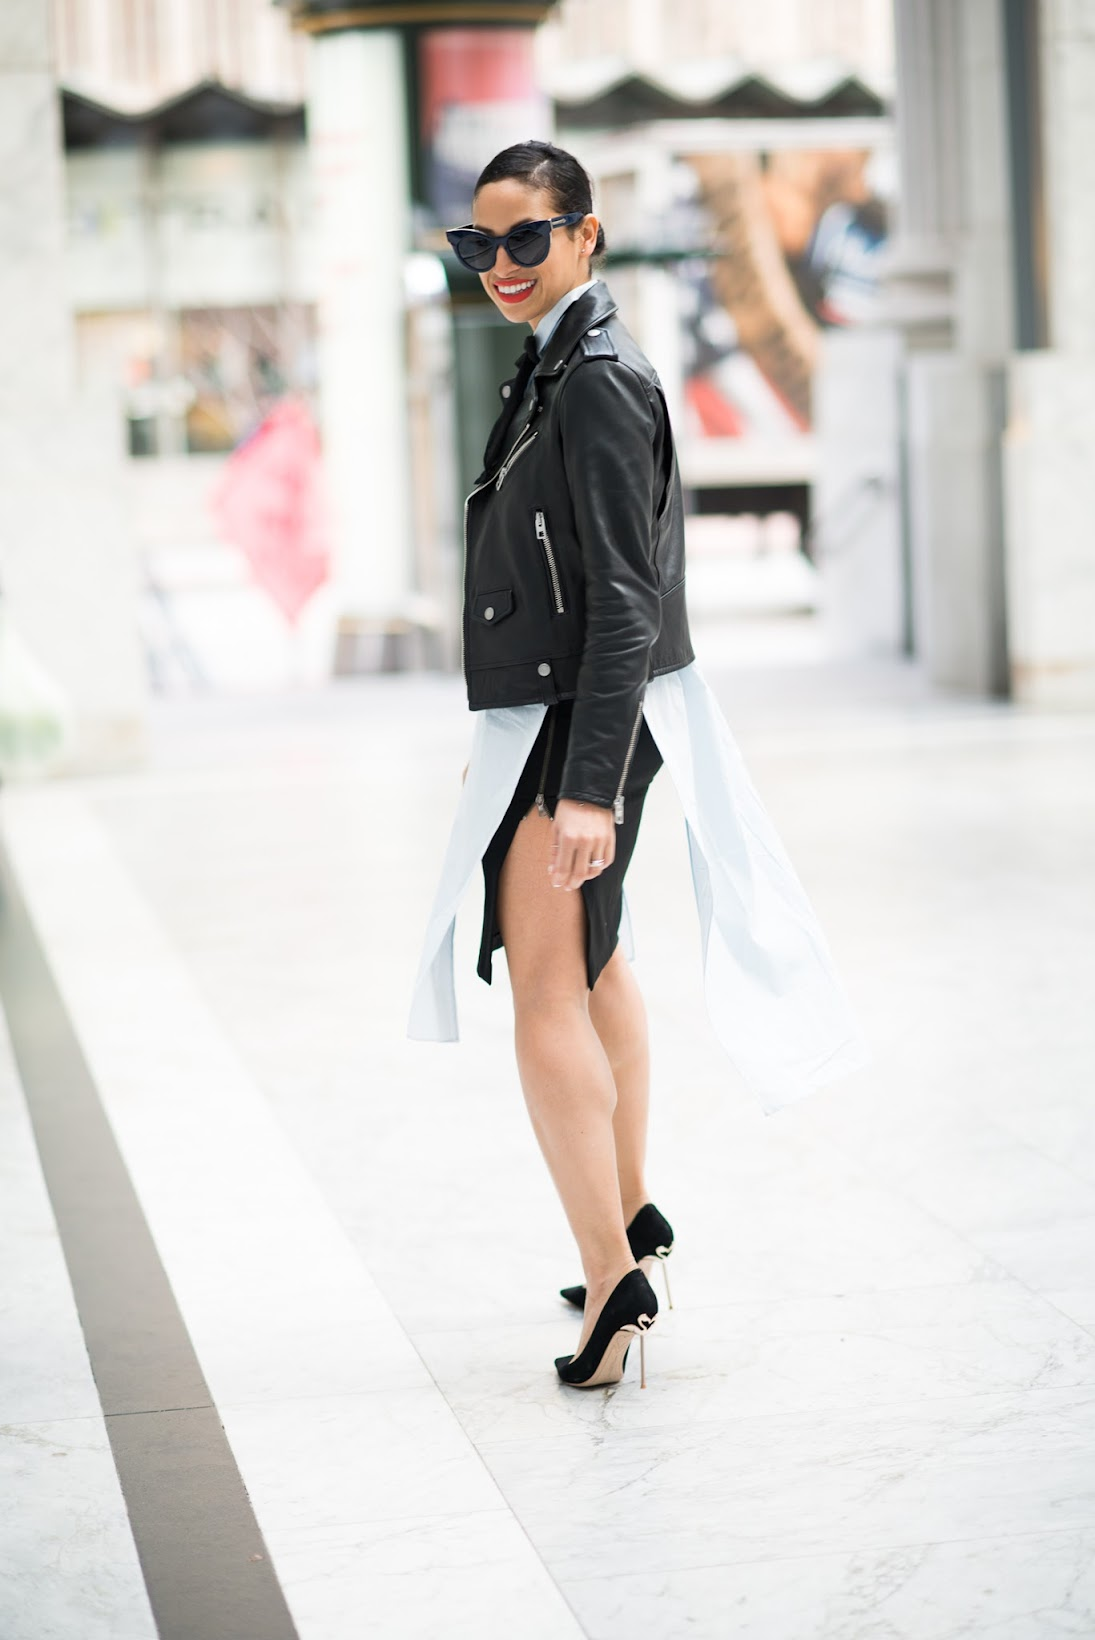 detachable bowtie, Asos, Zara, Sophia Webster Coco pumps, Flamingo pumps, Karen Walker Starburt sunglasses navy, feminine masculine style, Coach moto jacket, streetstyle, ootd